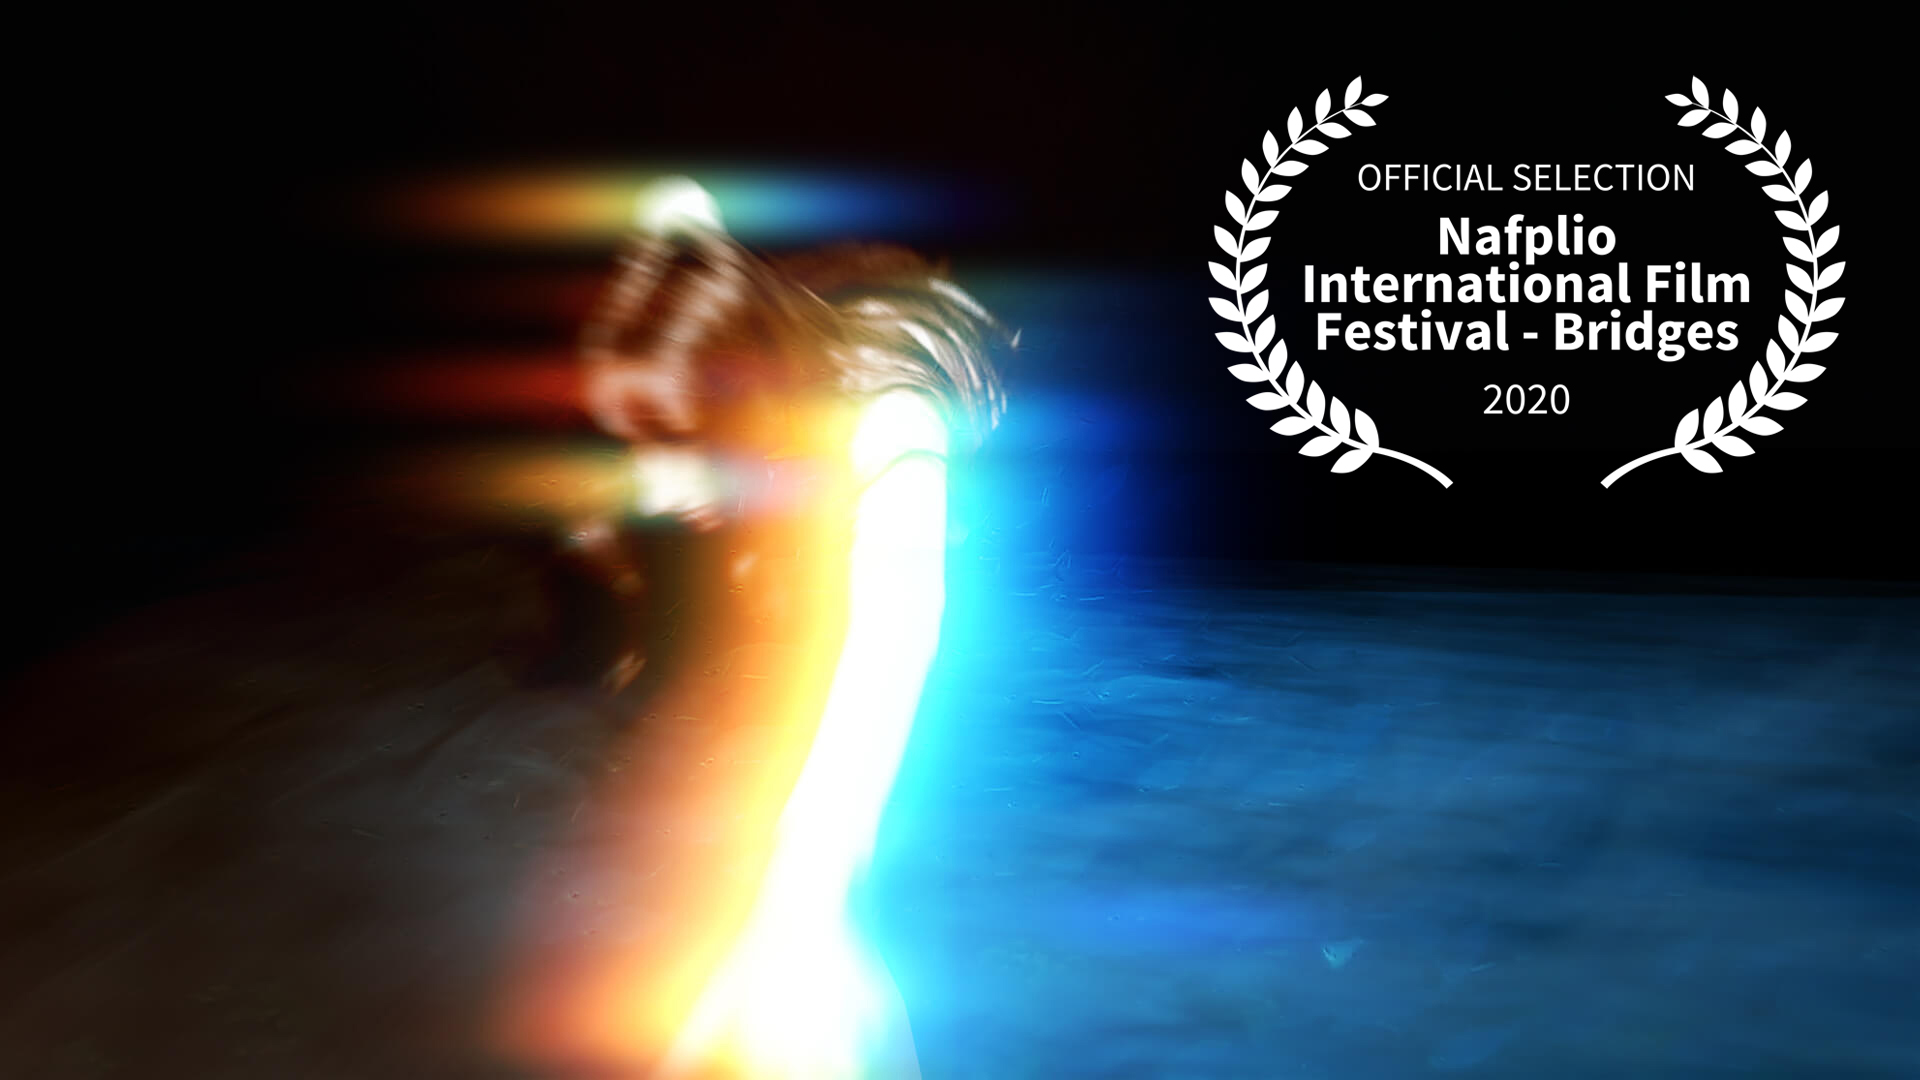 """Red Lion"" by Oh. Bridges International Film Festival at Nafplio, Greece"